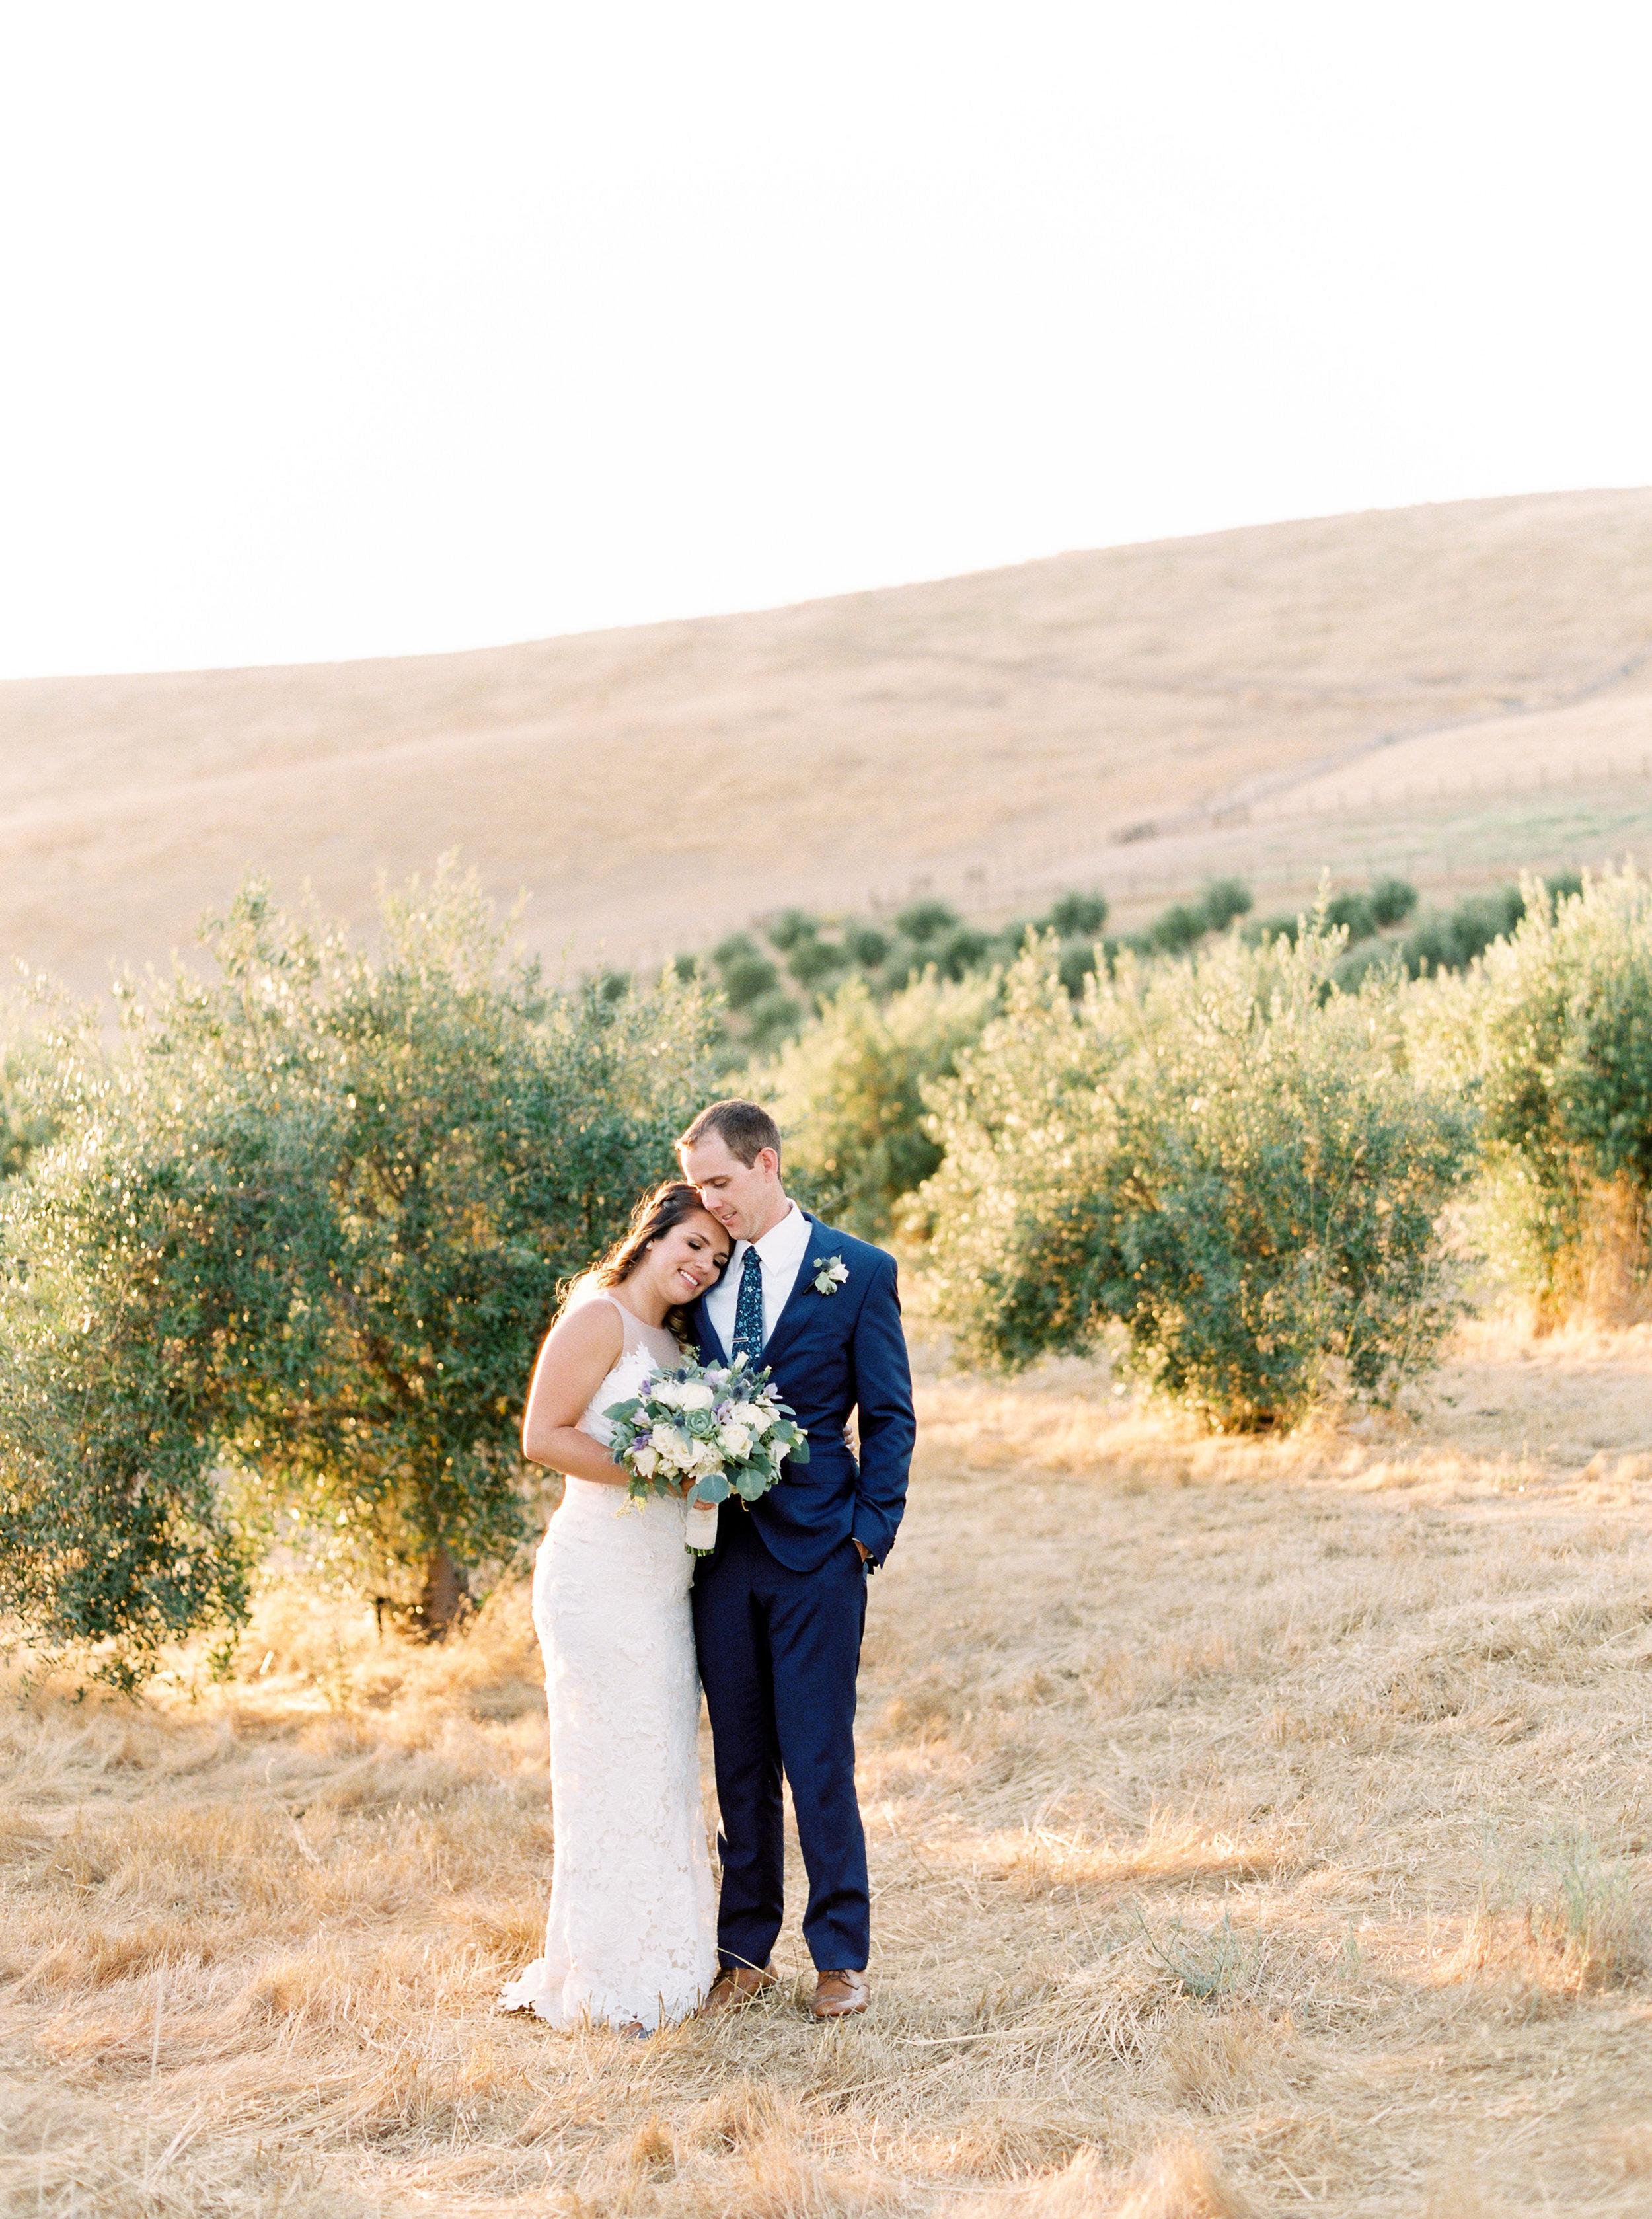 the-purple-orchid-resort-wedding-in-livermore-california-171.jpg